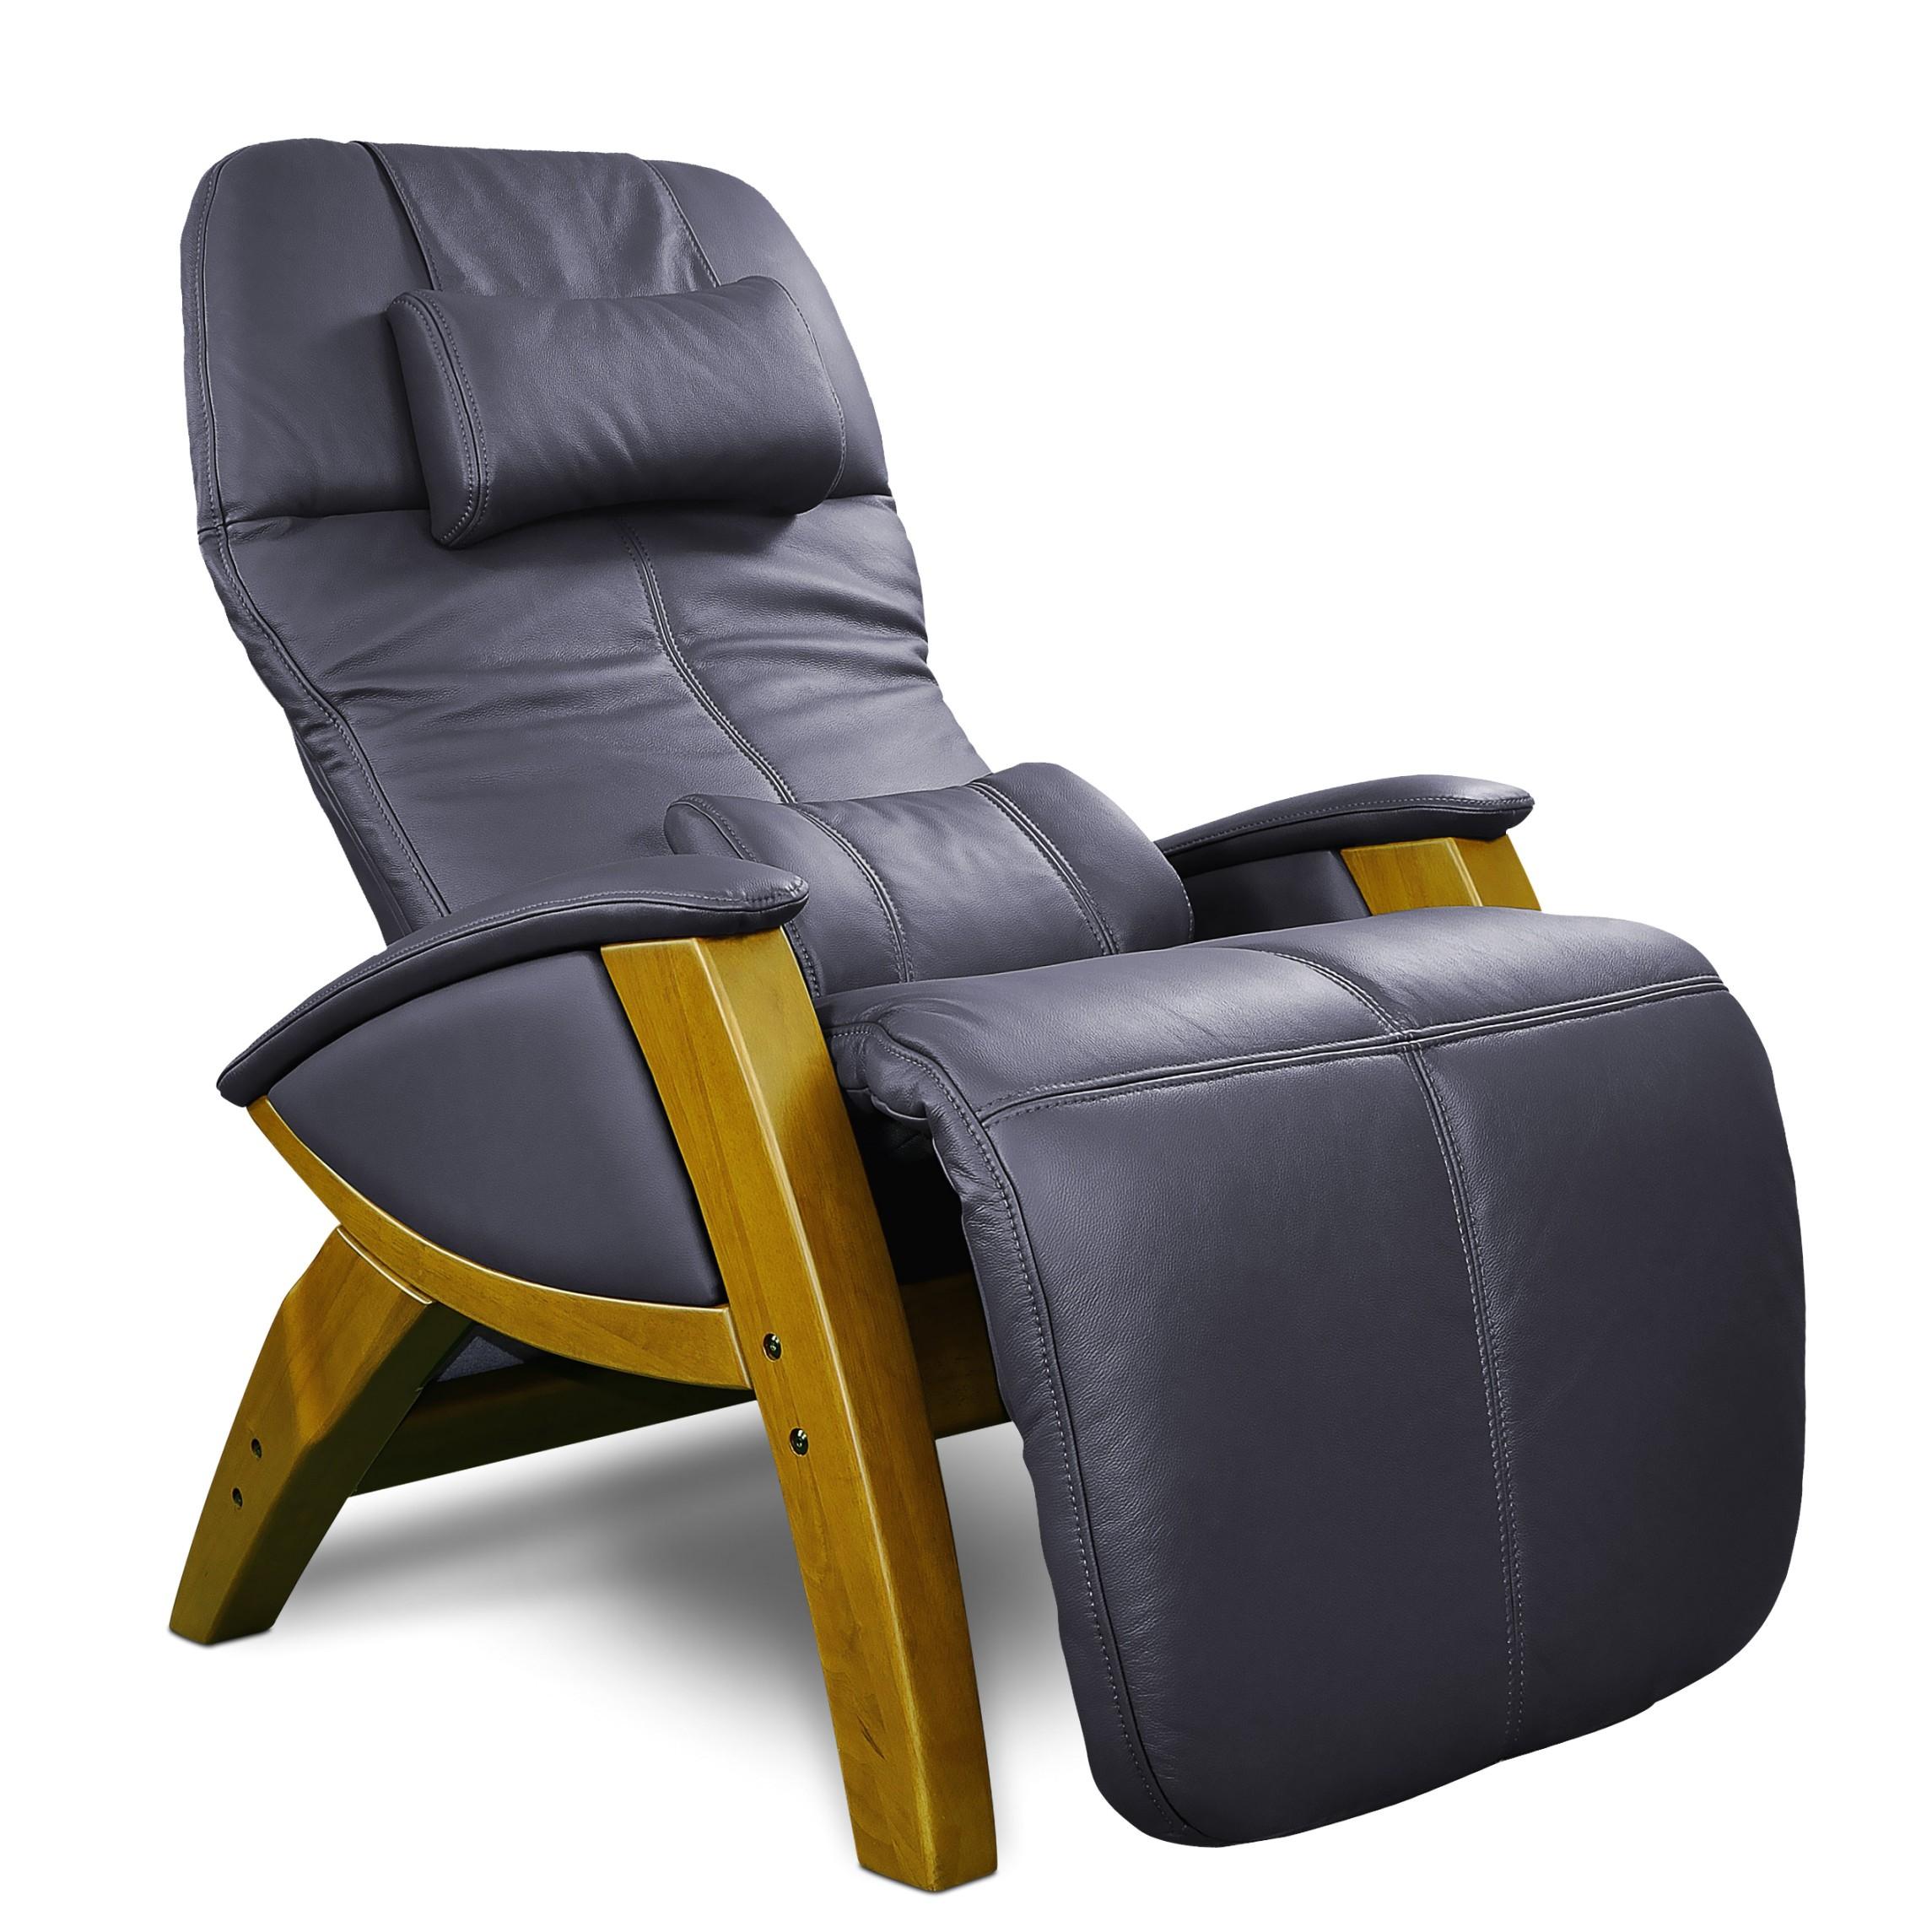 fresh kohls massage chair rtty1 rtty1